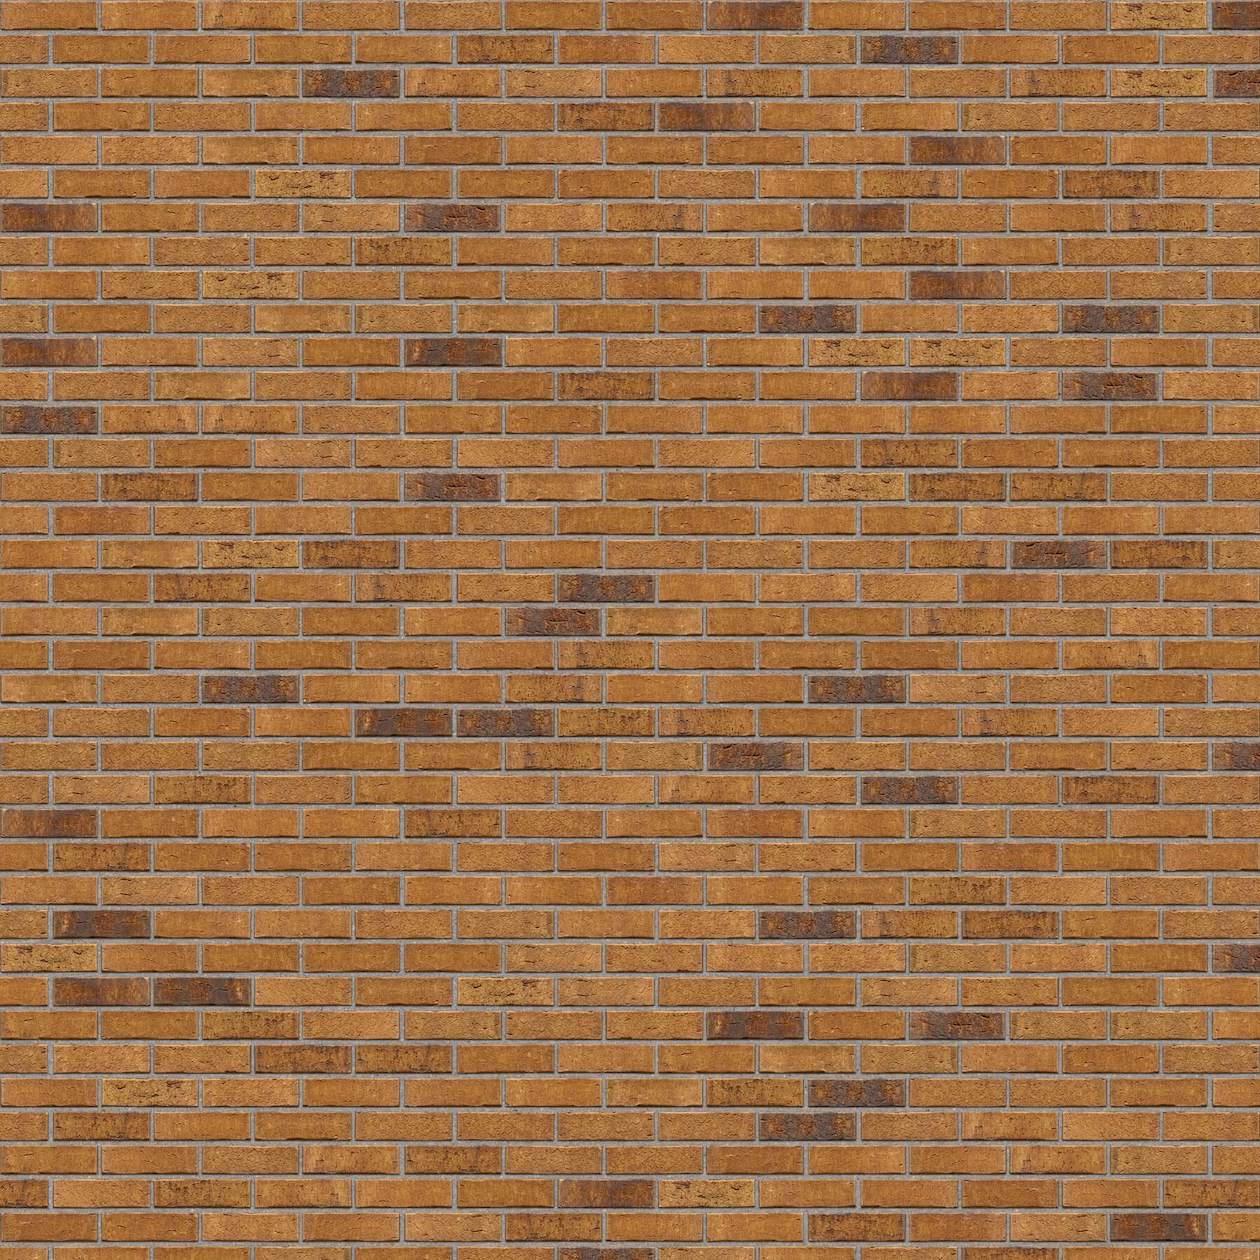 Puna-cigla-FeldHaus-Klinker-brick-house-nf-k-684-Siva Fuga